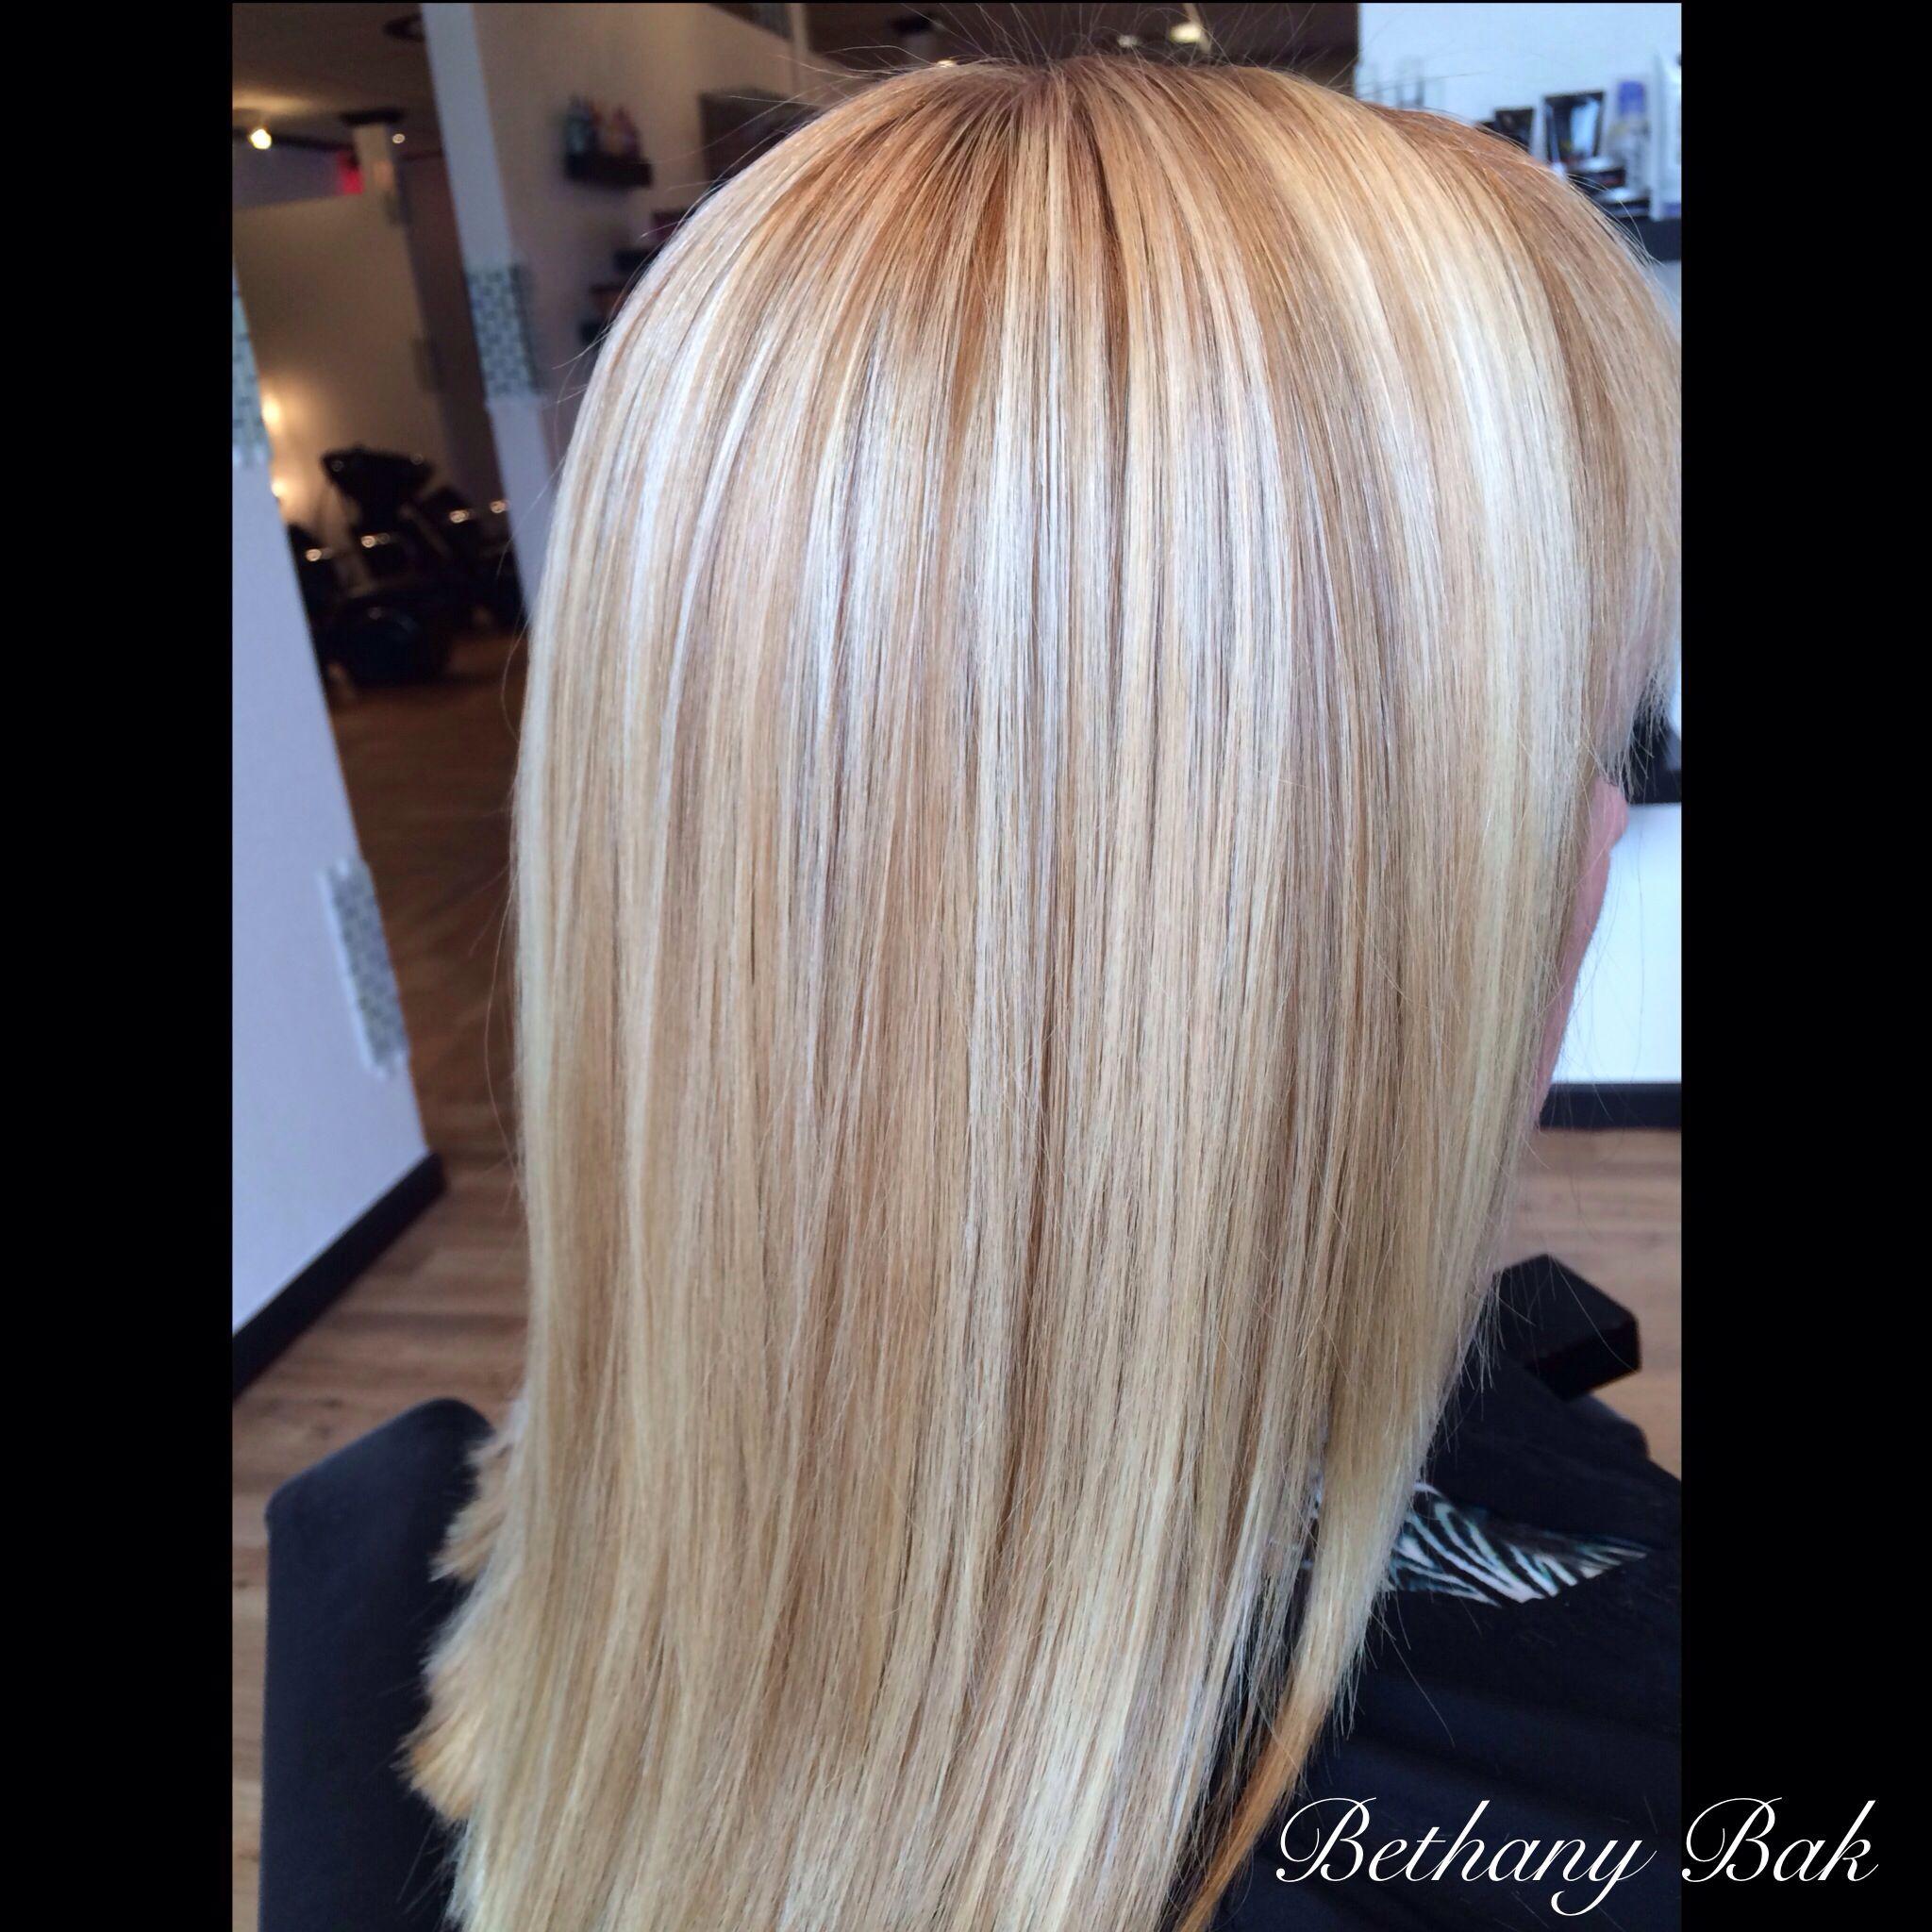 Beautiful blonde tones.